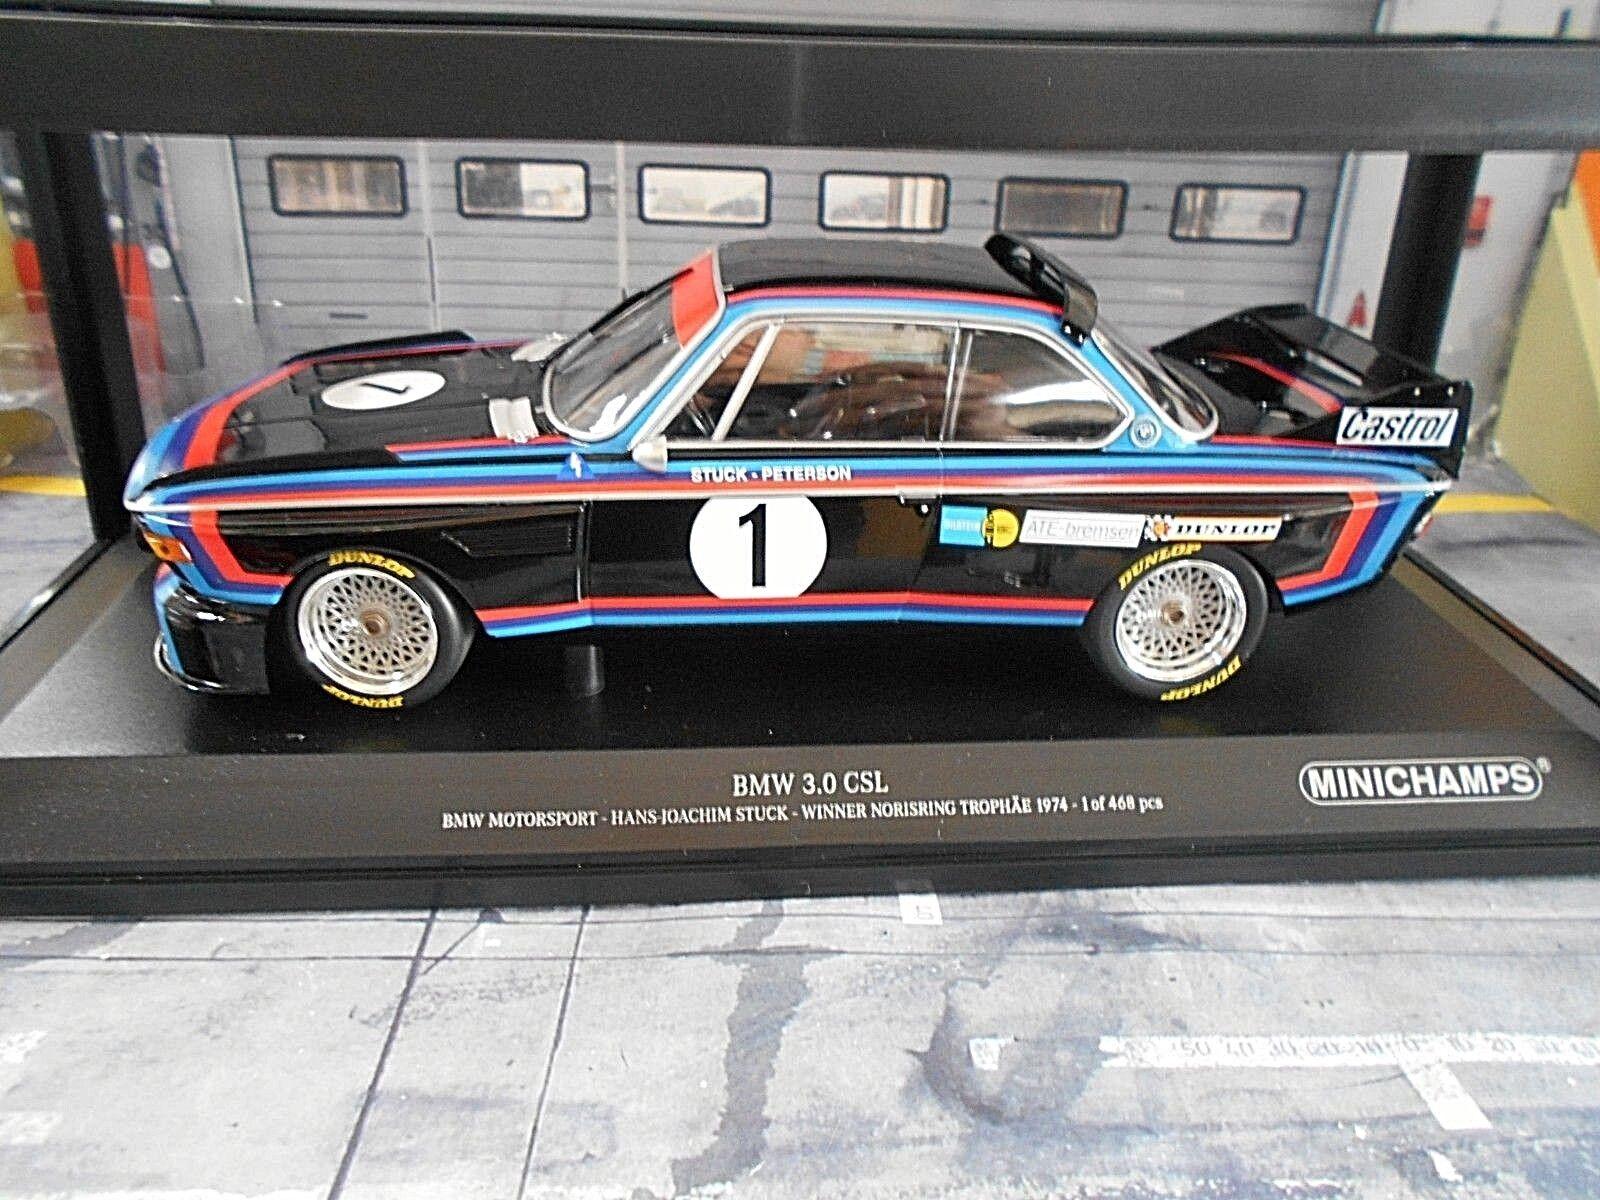 BMW 3.0 CSL NORISRING DRM 1974  1 stuc CASTROL CASTROL CASTROL Works Winner Nouveau MINICHAMPS 1 18 7f0f56